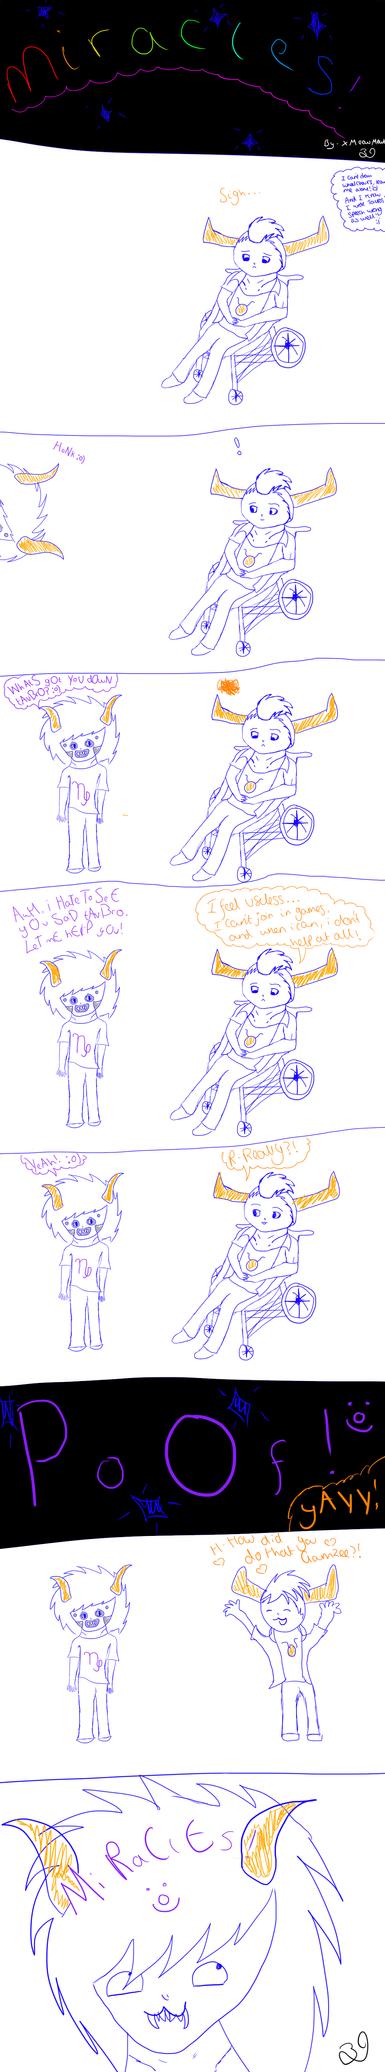 Miracles! (Homestuck Comic) by XMeowMewX